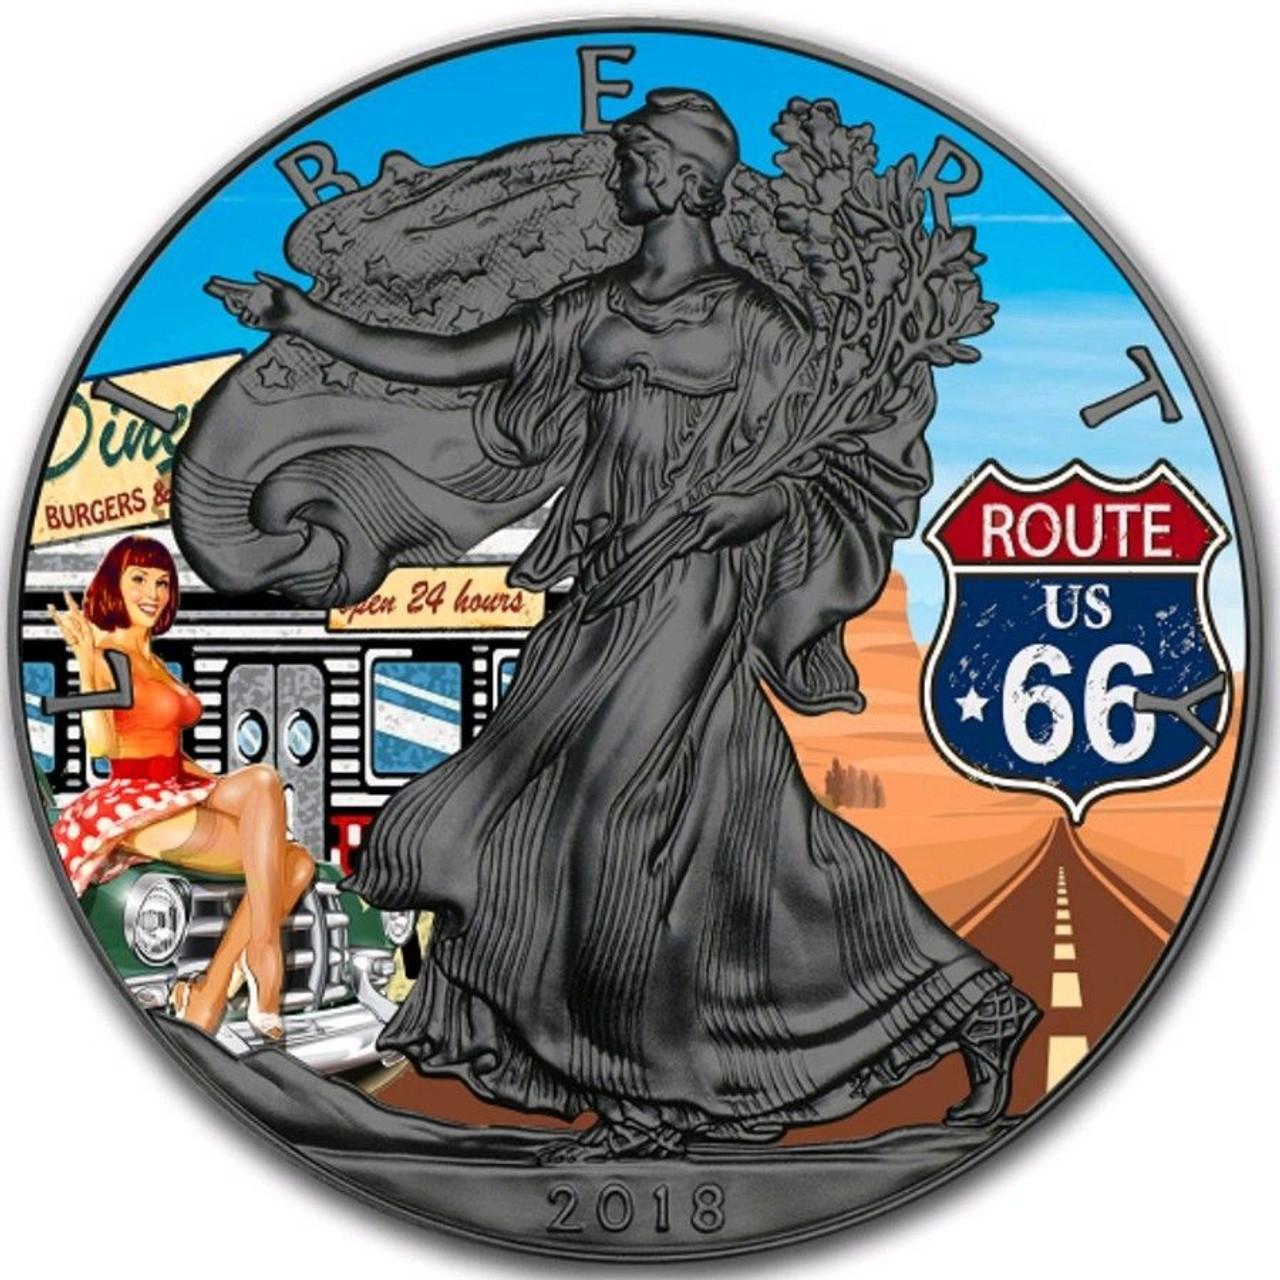 2018 1 Oz Silver $1 ARCTIC BLAST EAGLE Ruthenium Coin